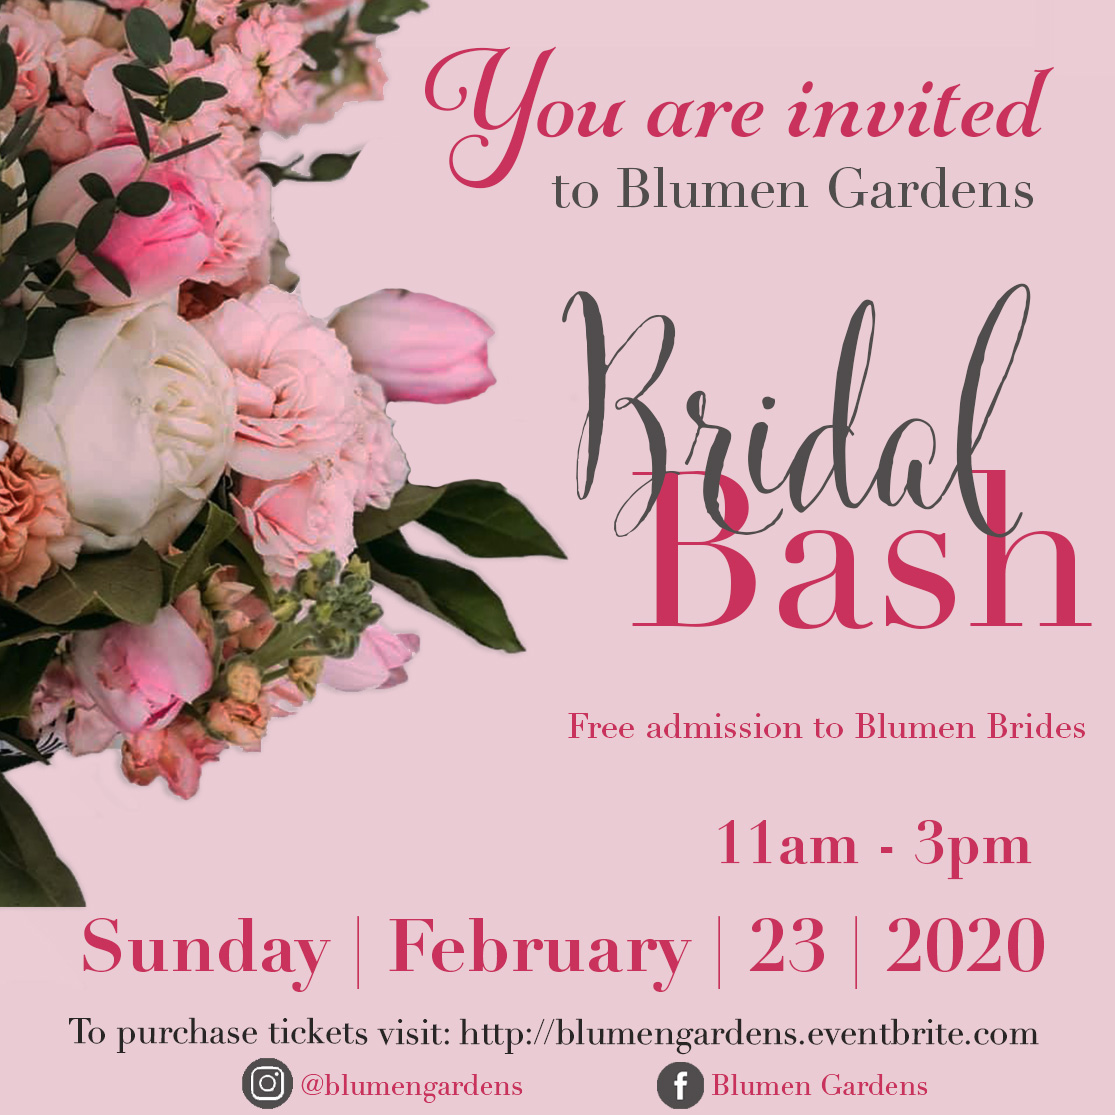 550620293691154371_blumen_bridal_bash_graphic